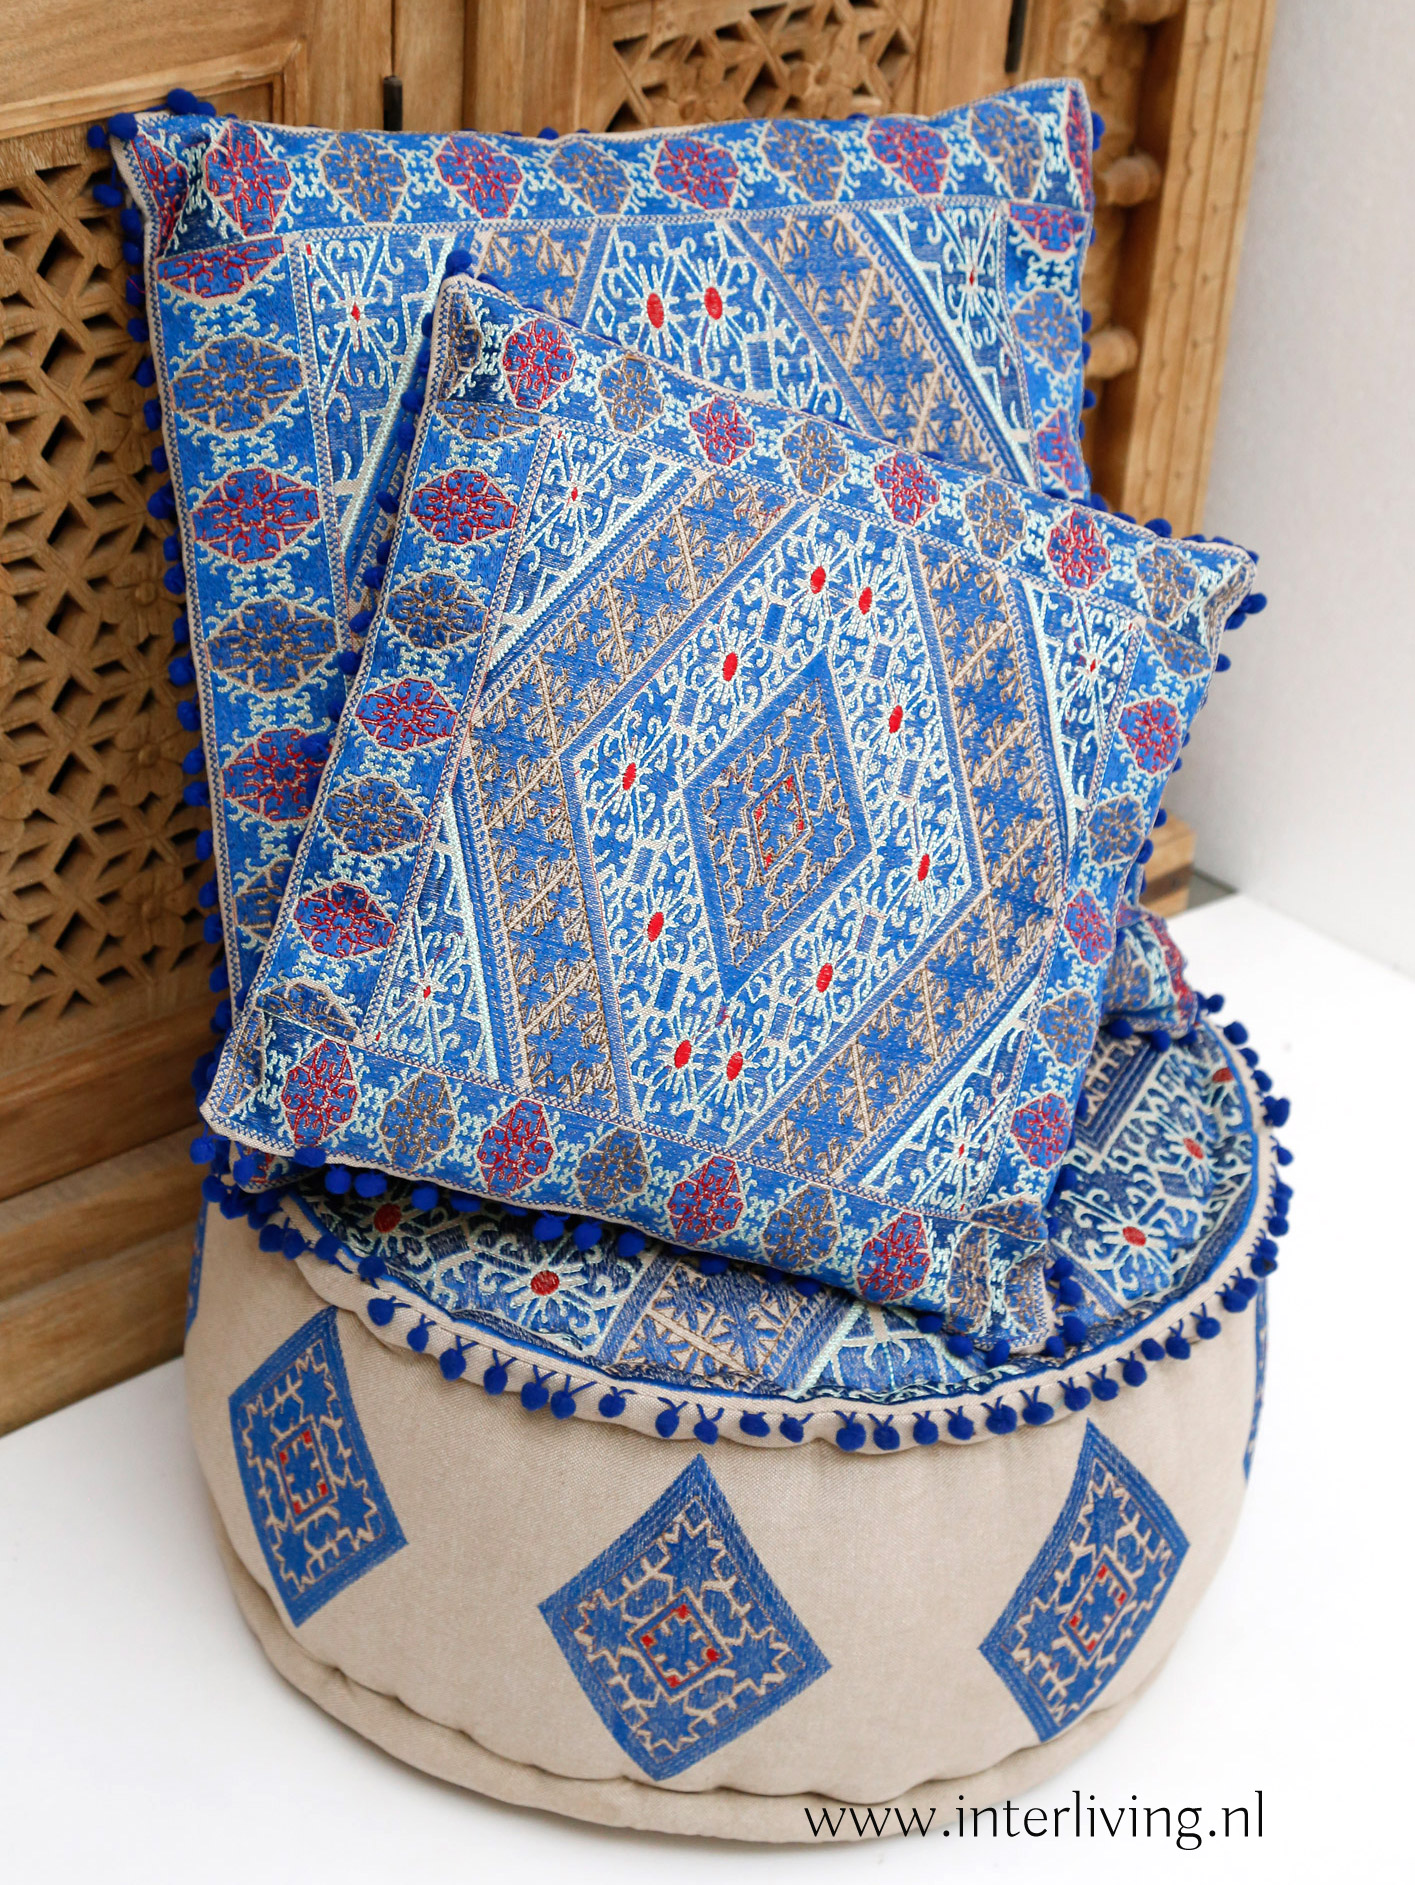 blauwe kussens marokkaans